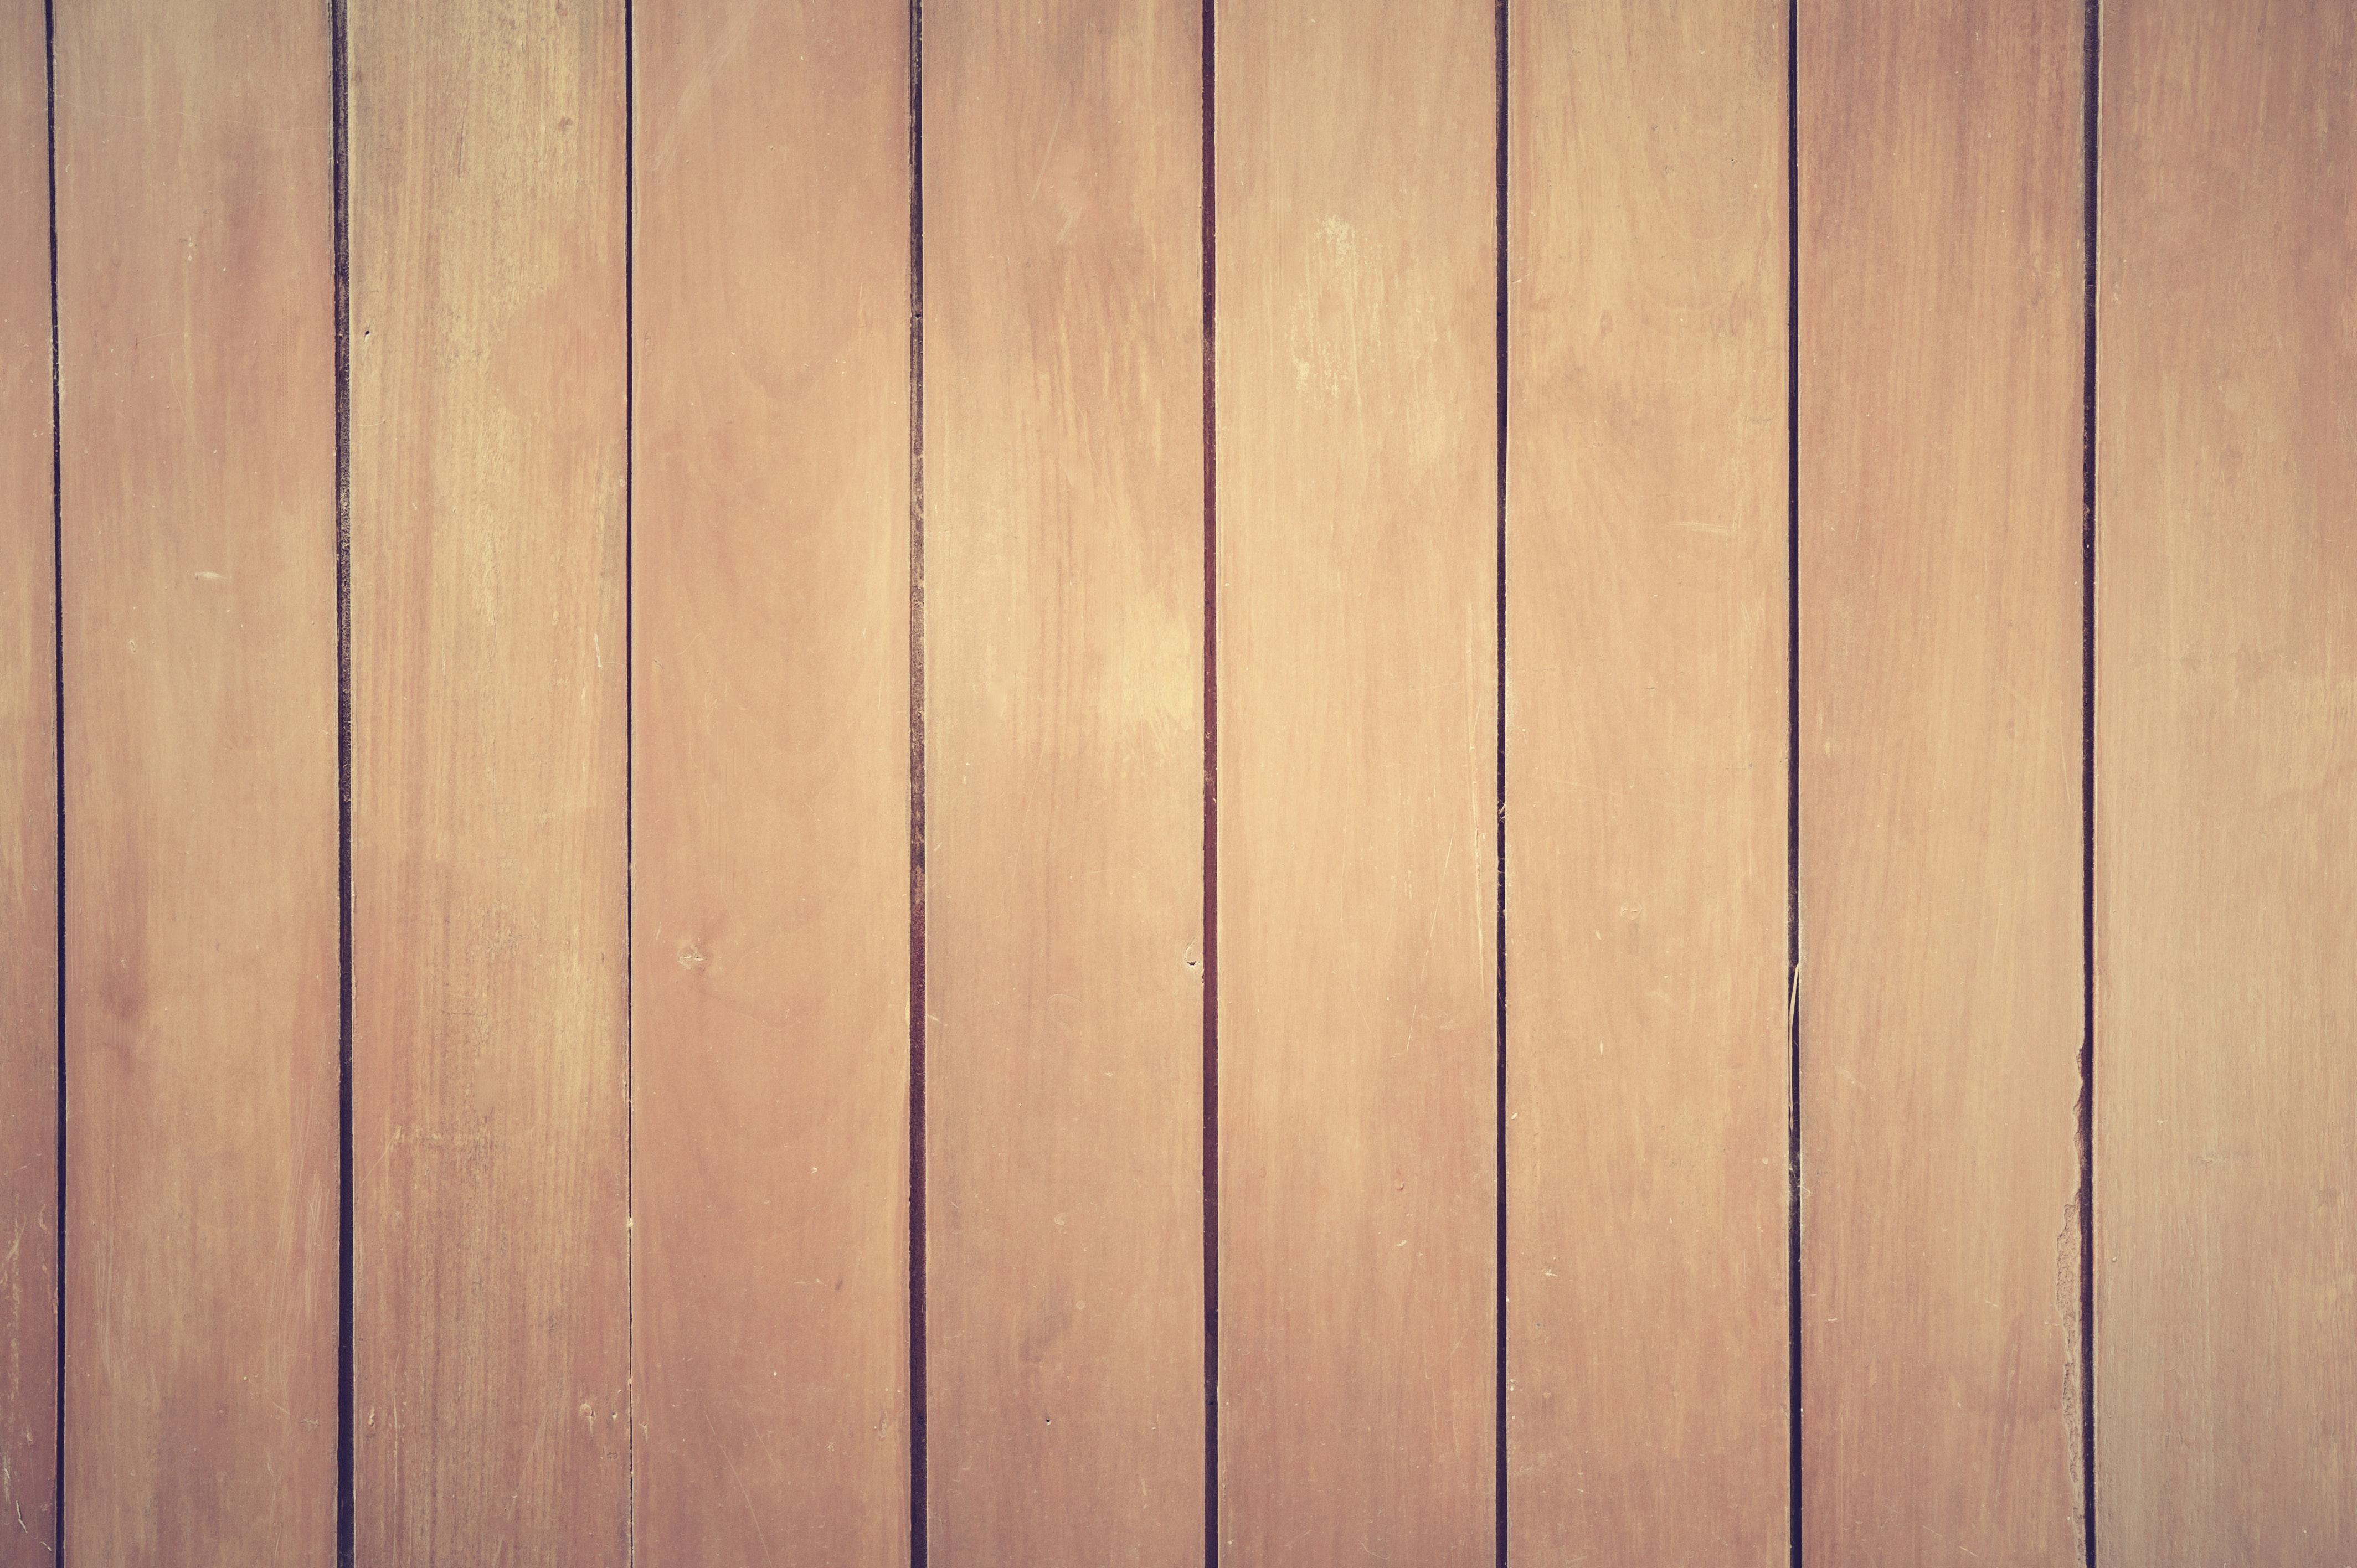 Gray Wood Plank 183 Free Stock Photo